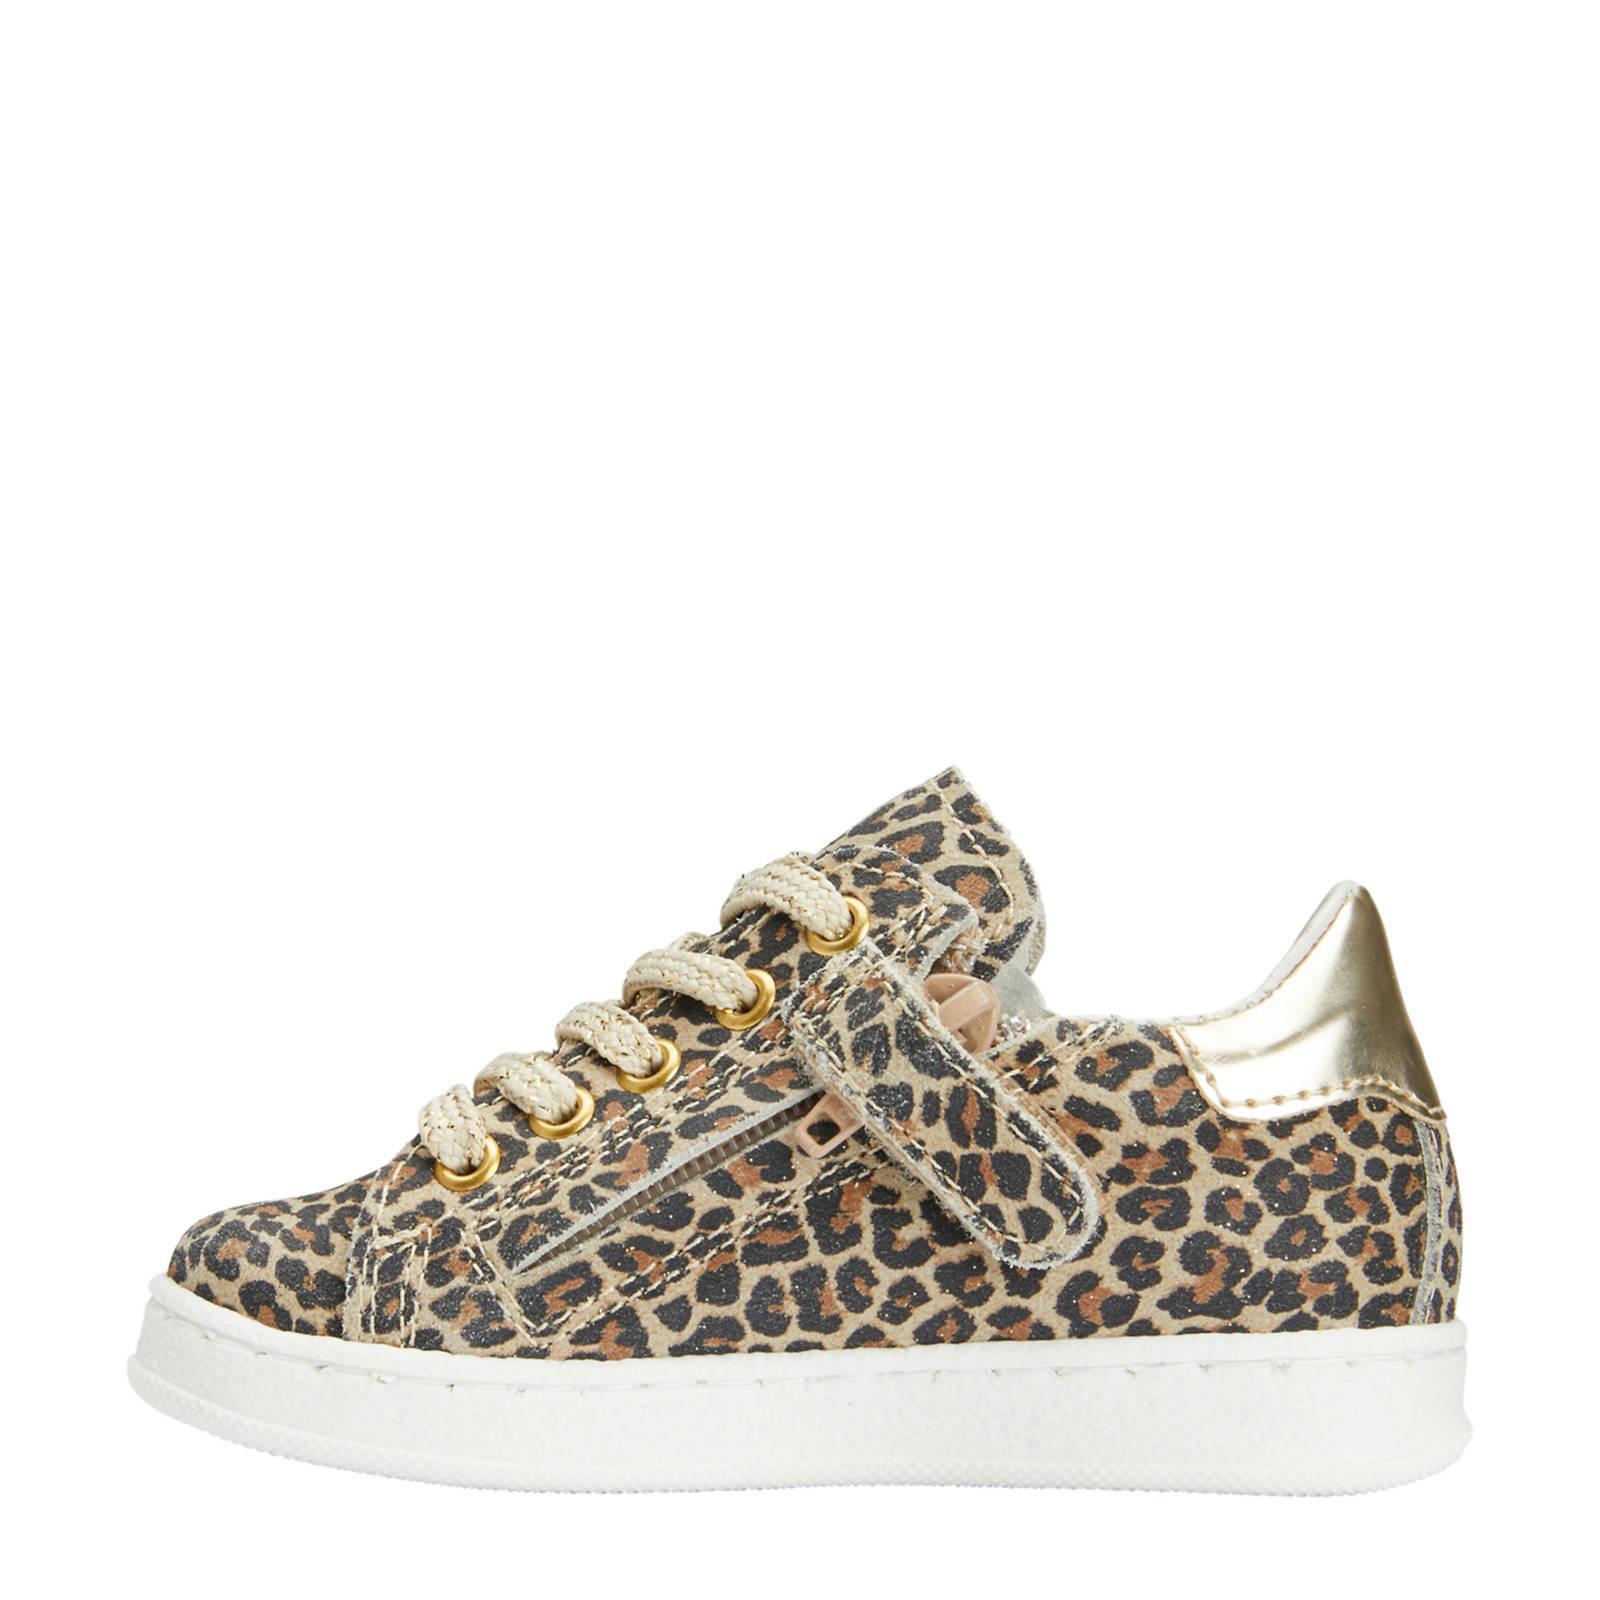 meet 7cfb9 d9ce6 cupcake-couture-leren-sneakers-met-panterprint-beige-4059894615995.jpg